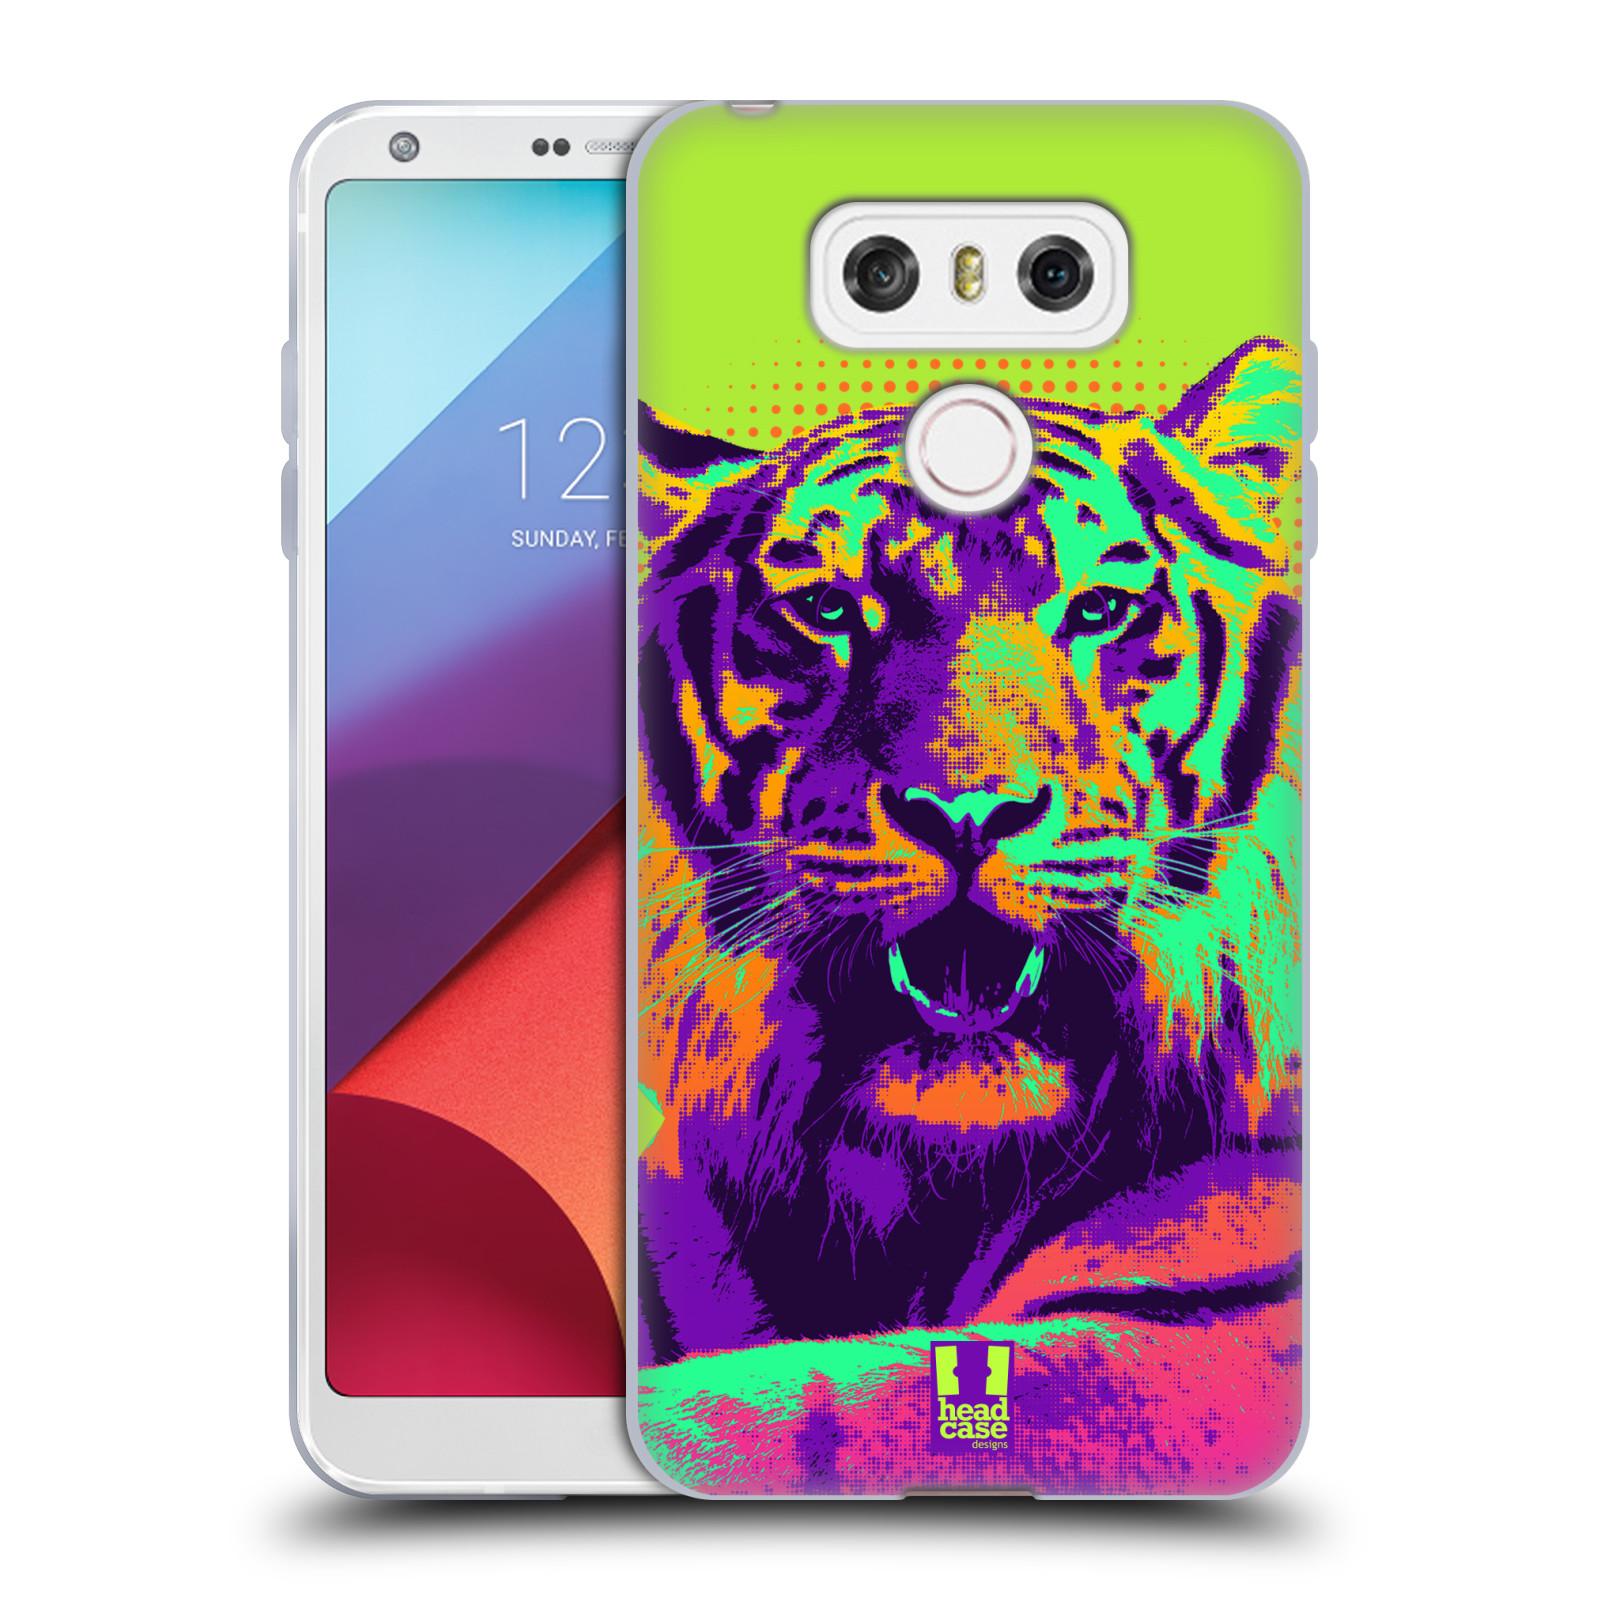 Silikonové pouzdro na mobil LG G6 - Head Case POP PRINT TYGR (Silikonový kryt či obal na mobilní telefon LG G6 H870 / LG G6 Dual SIM H870DS)